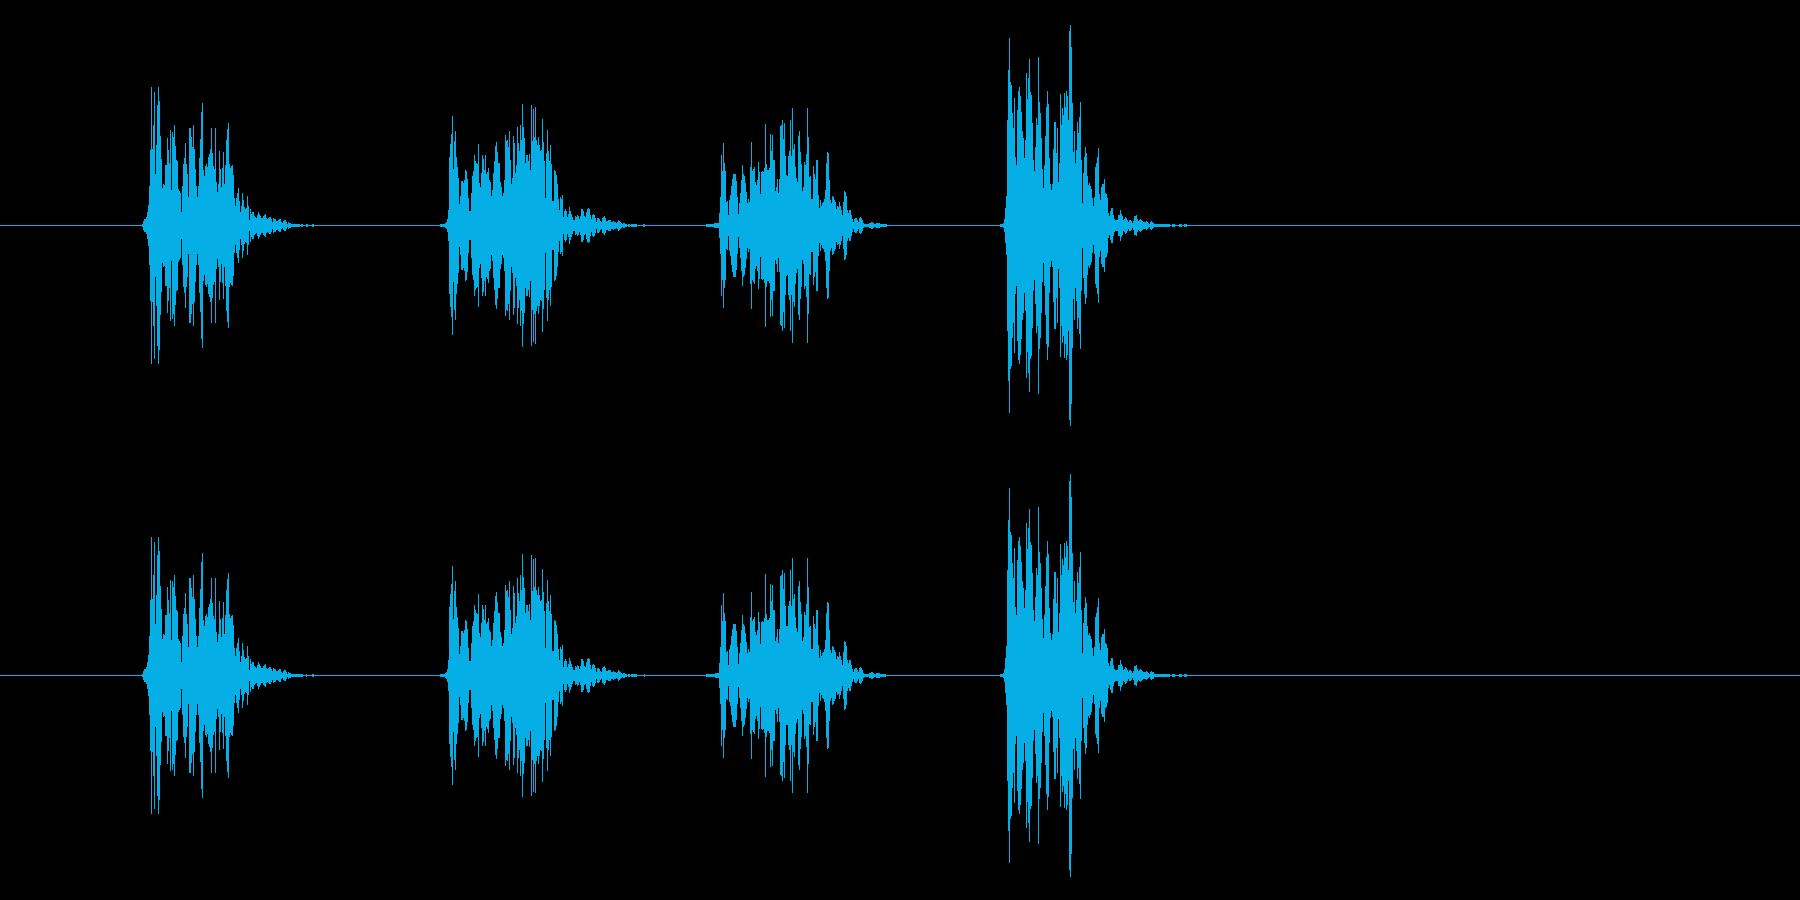 PC マウス02-19(スクロール 速)の再生済みの波形